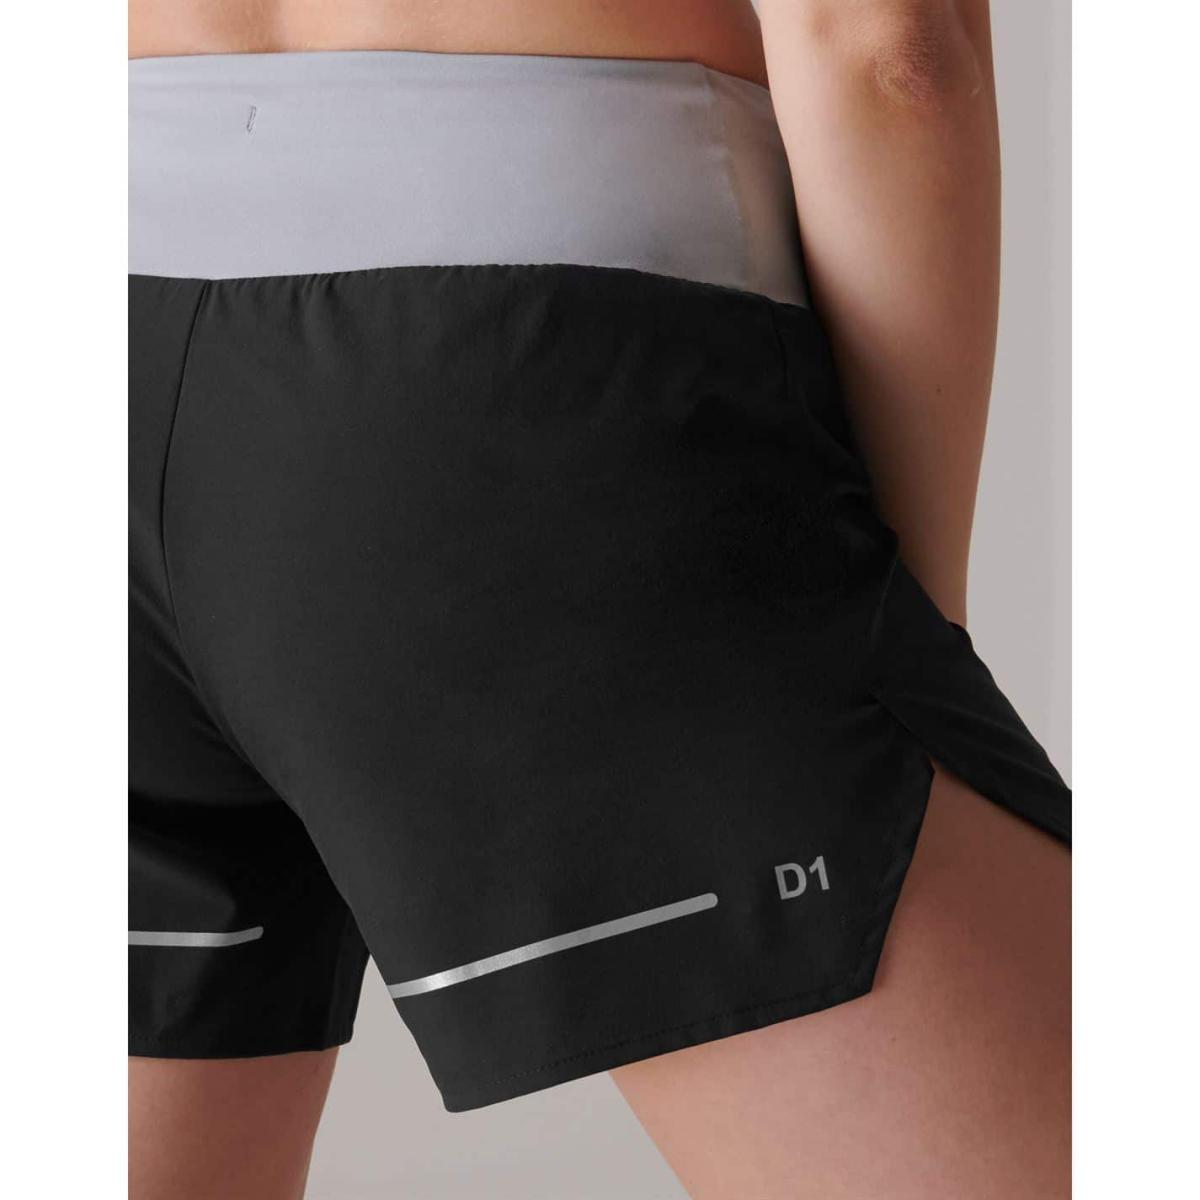 Asics Ls 4.5 Inch Jogging Kurzhose Shorts Damen